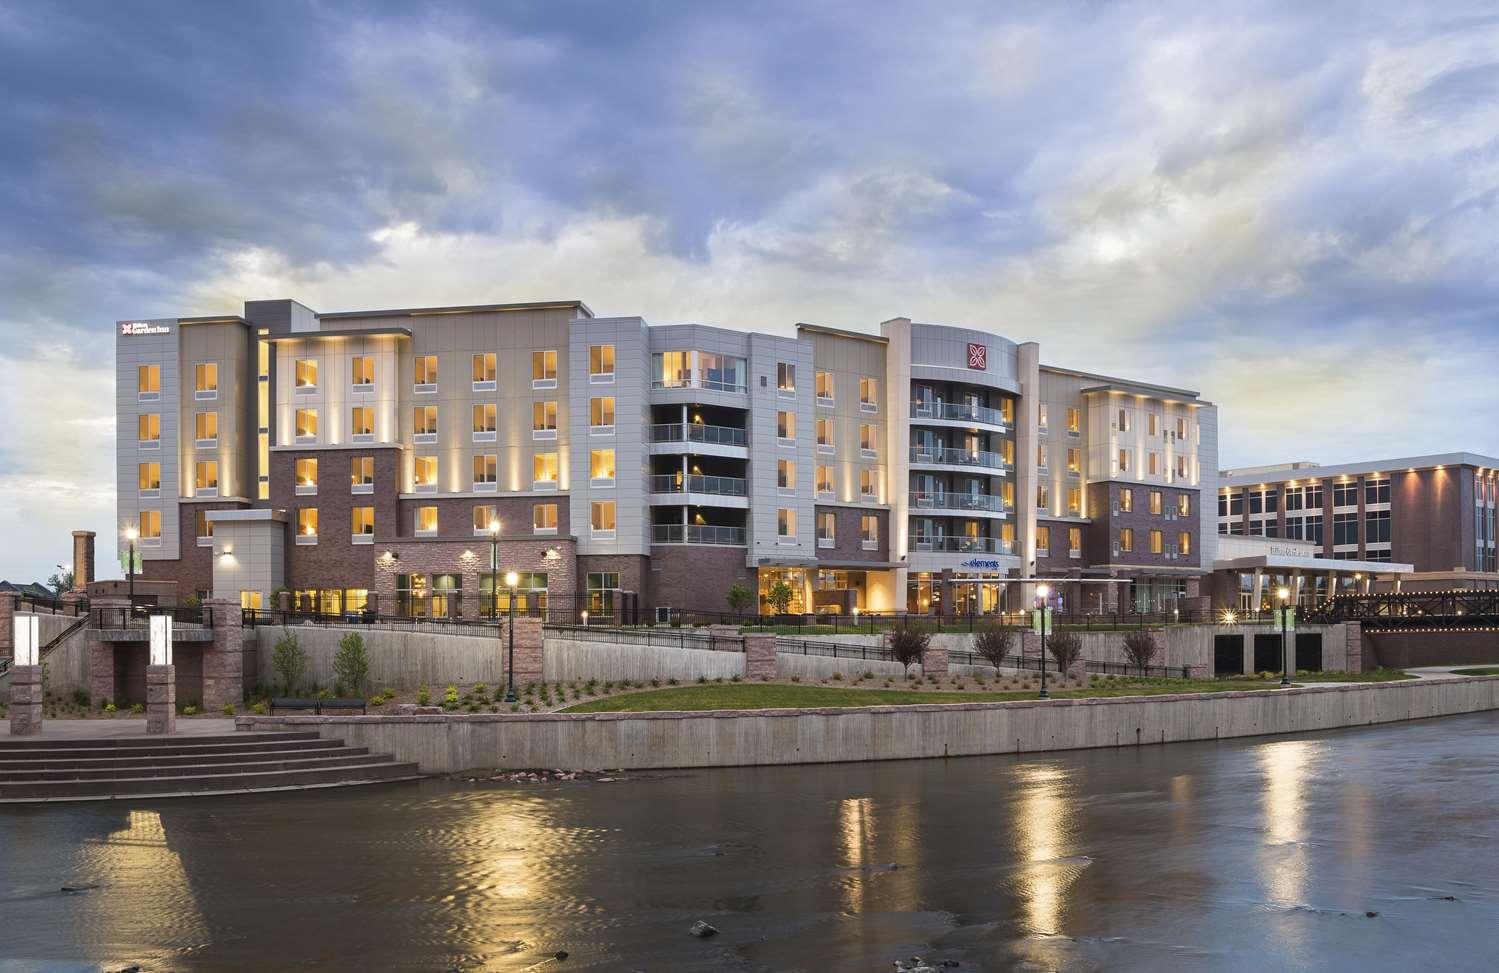 Exterior view - Hilton Garden Inn Downtown Sioux Falls